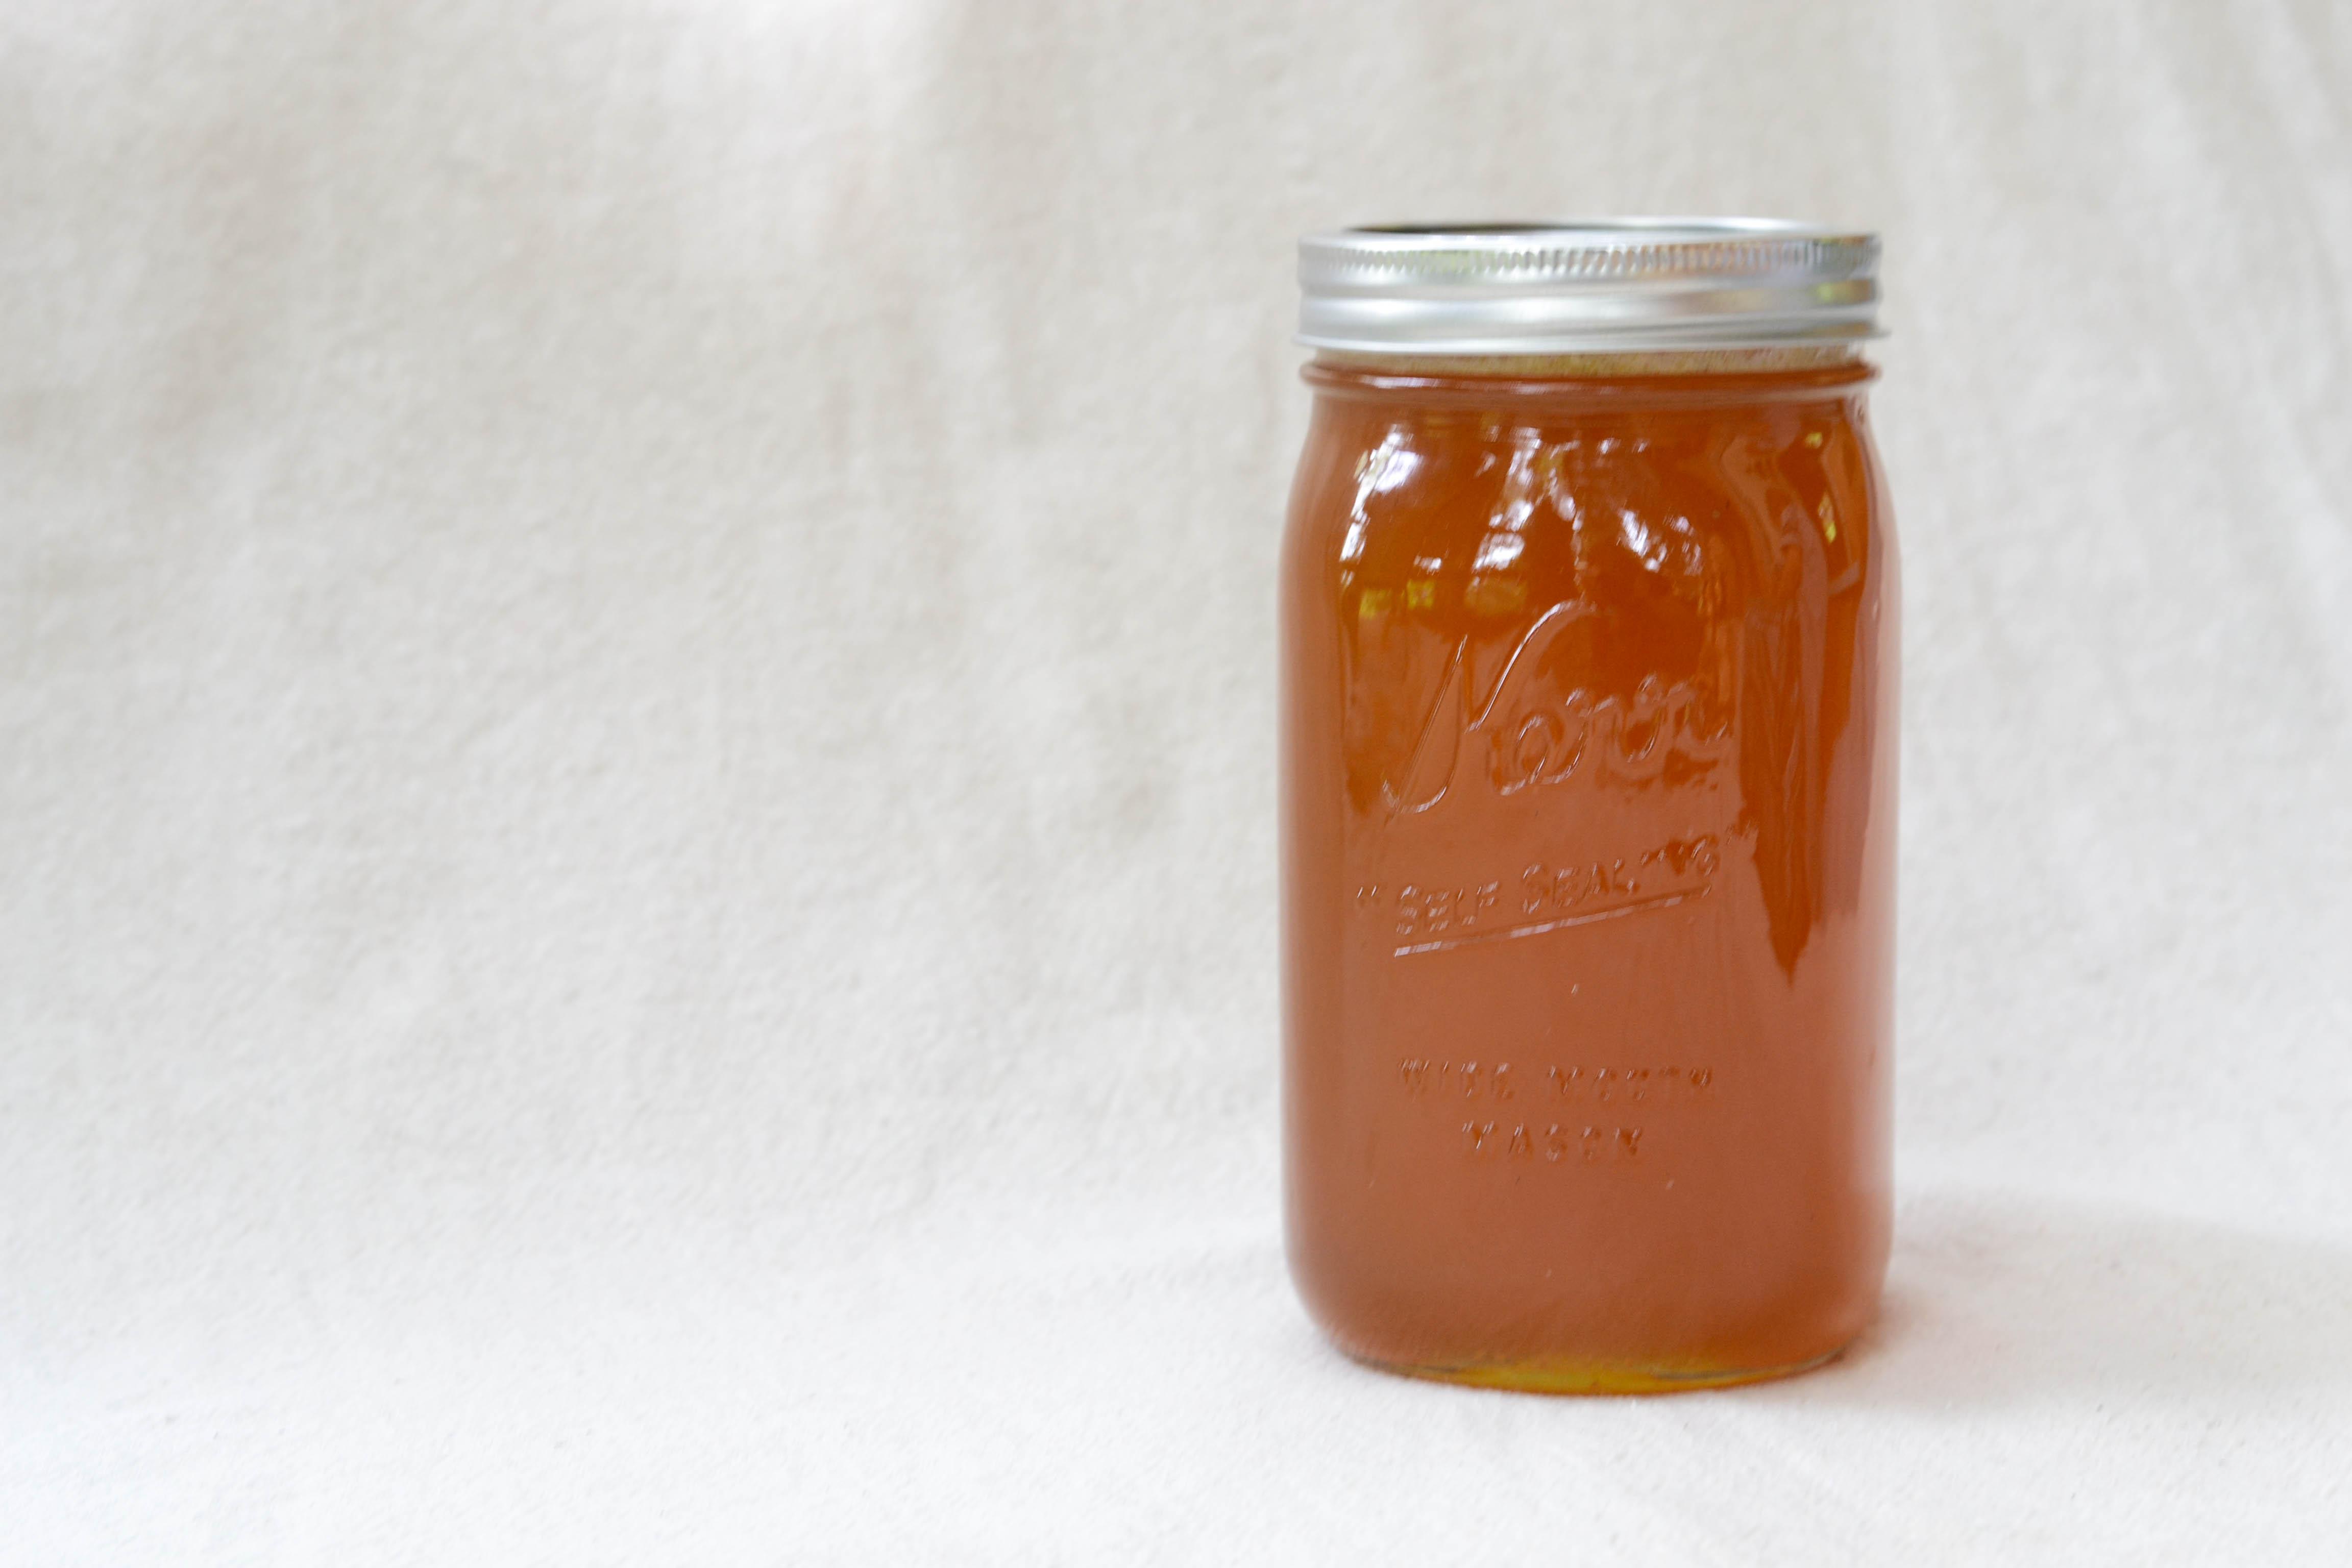 Simply excellent Lick jar honey